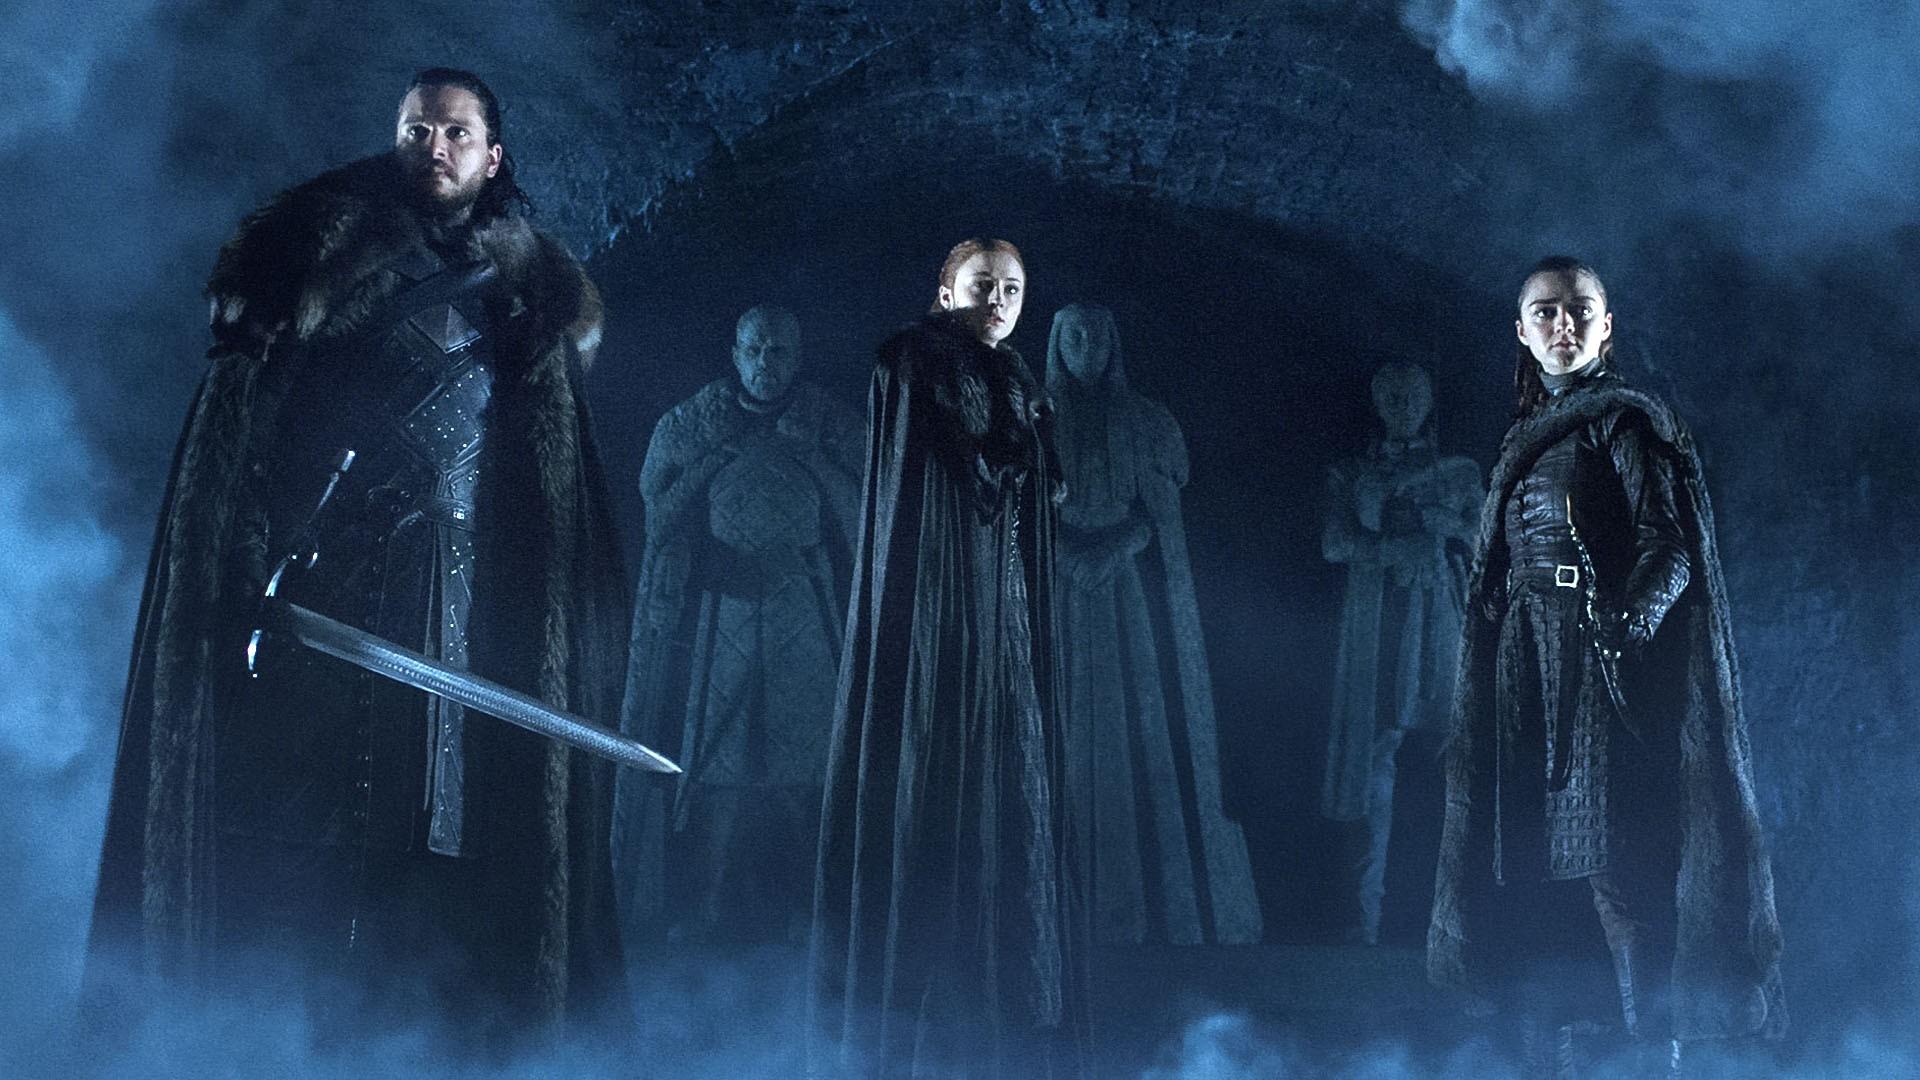 22 Game Of Thrones 8 Wallpapers On Wallpapersafari